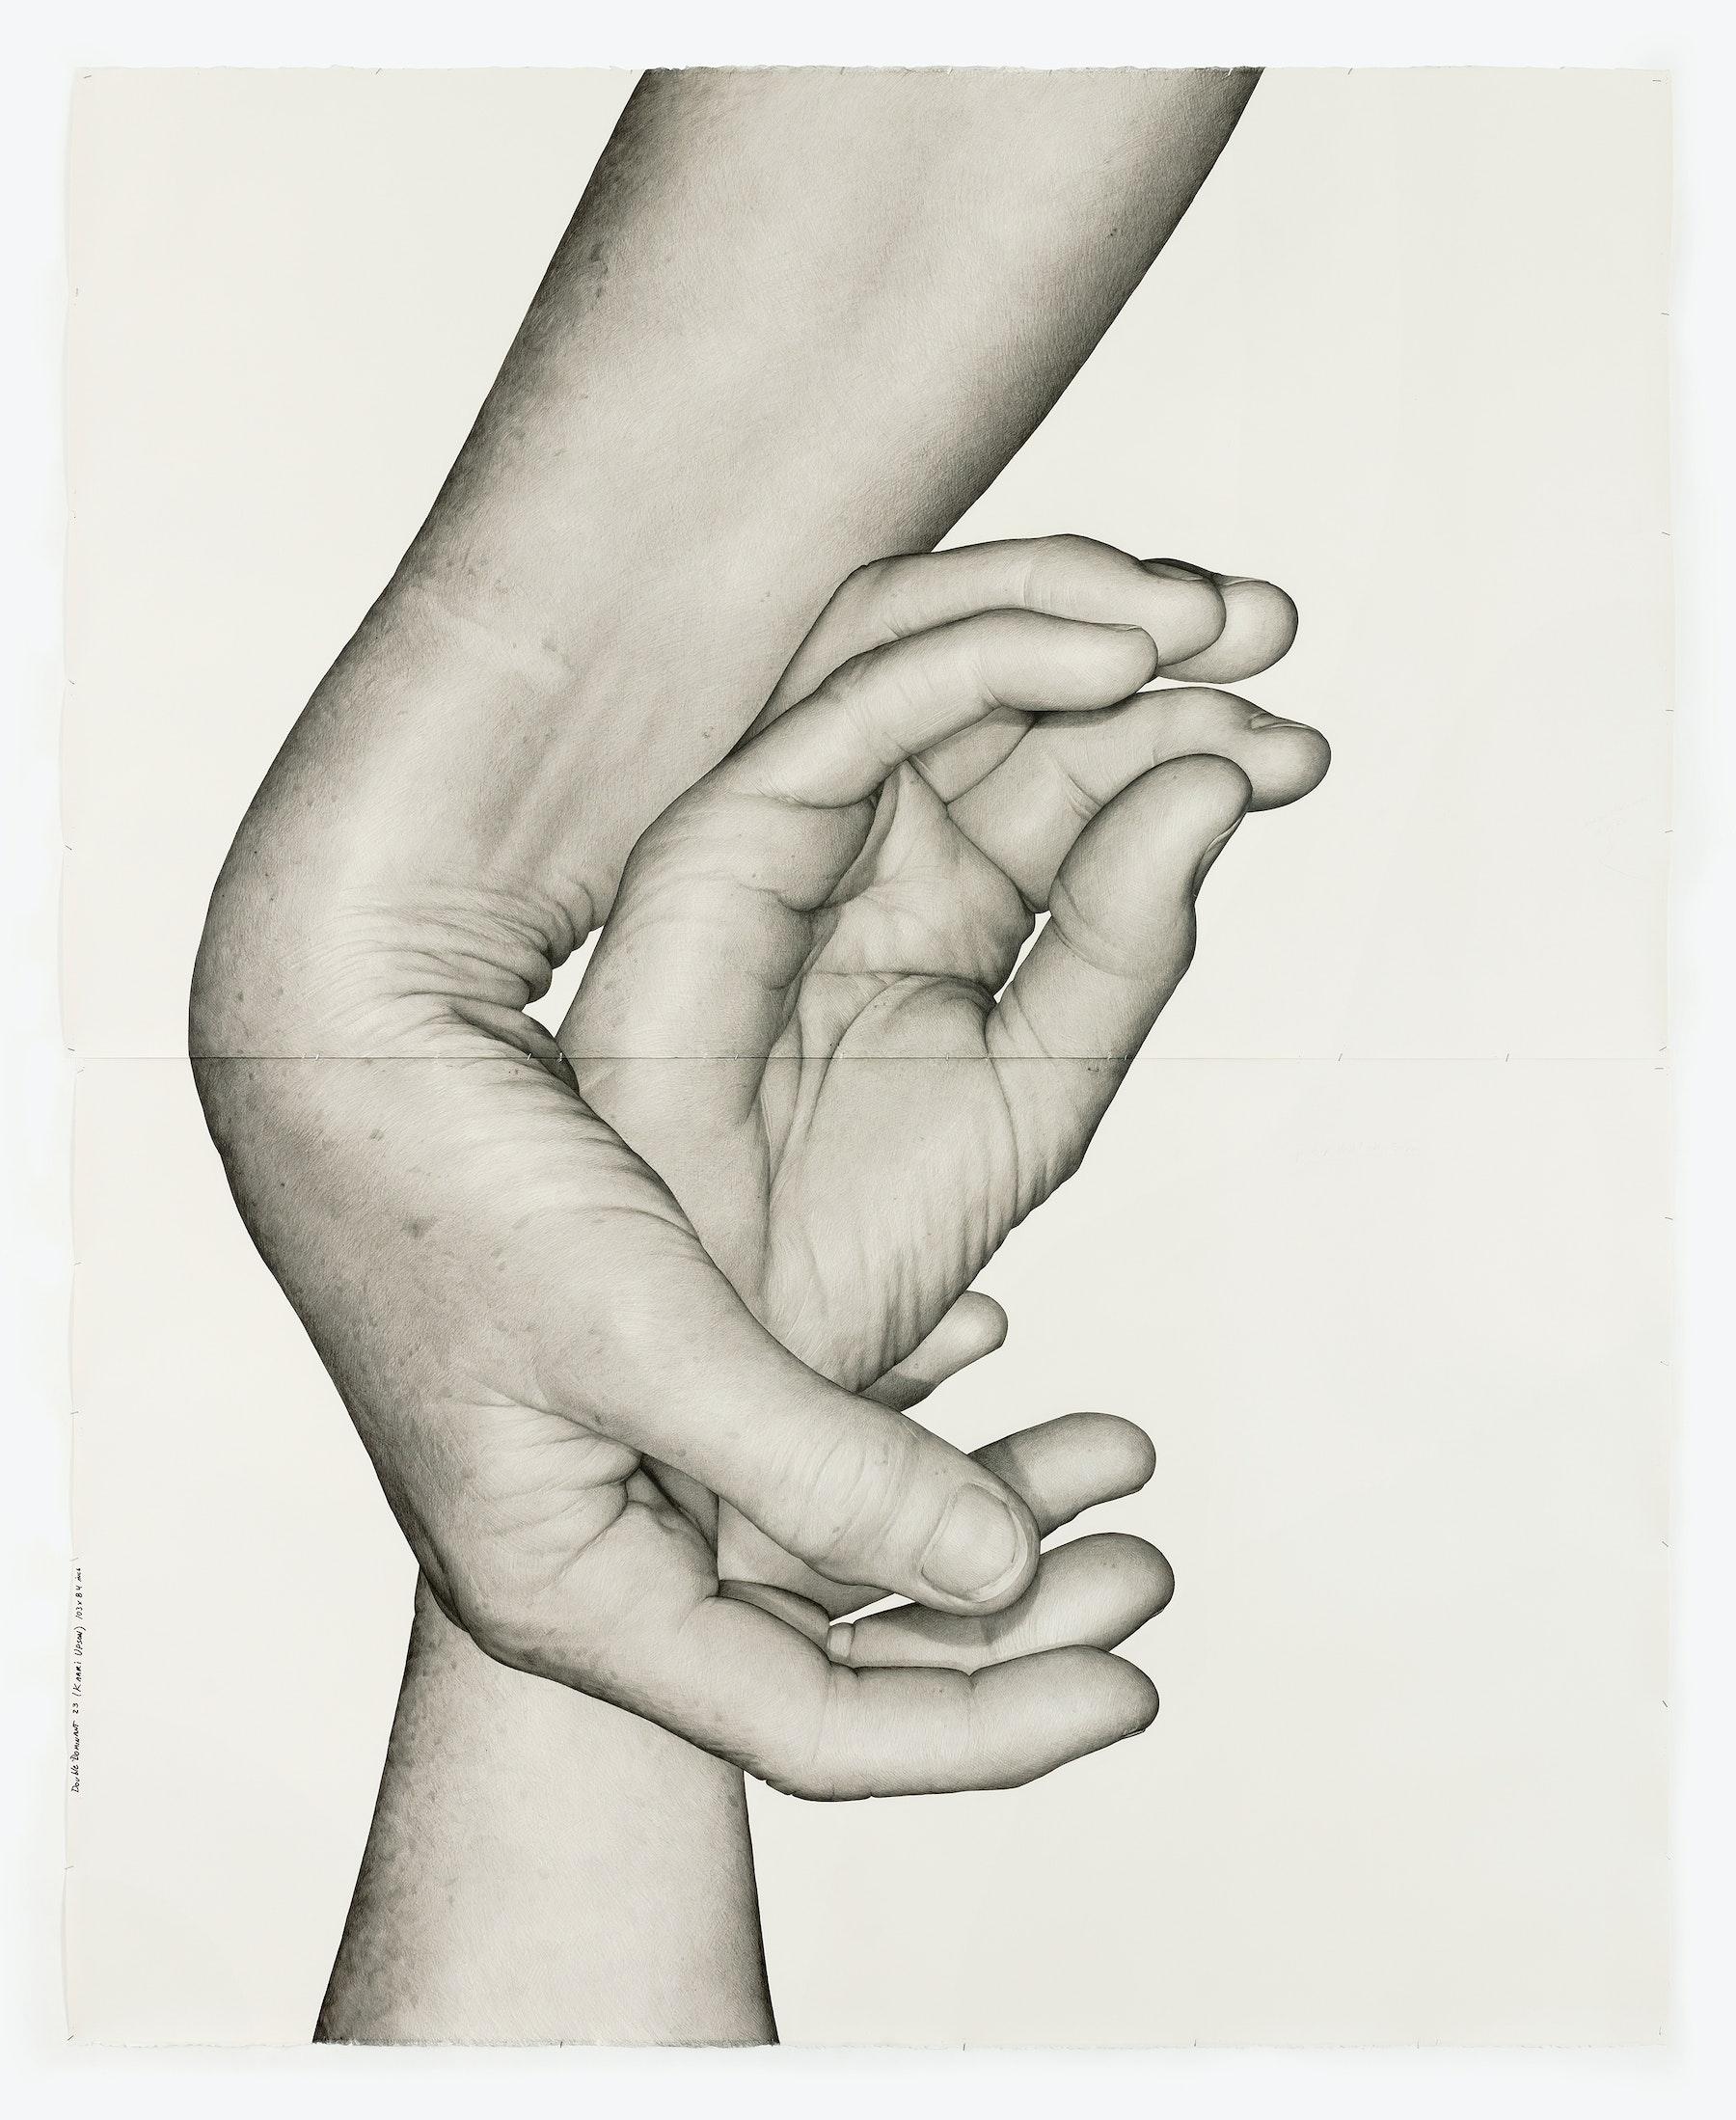 "Karl Haendel ""Double Dominant 23 (Kaari Upson),"" 2019 Pencil on paper 103 x 84"" [HxW] (261.62 x 213.36 cm) Inventory #HAE573 Courtesy of the artist and Vielmetter Los Angeles Photo credit: Robert Wedemeyer"